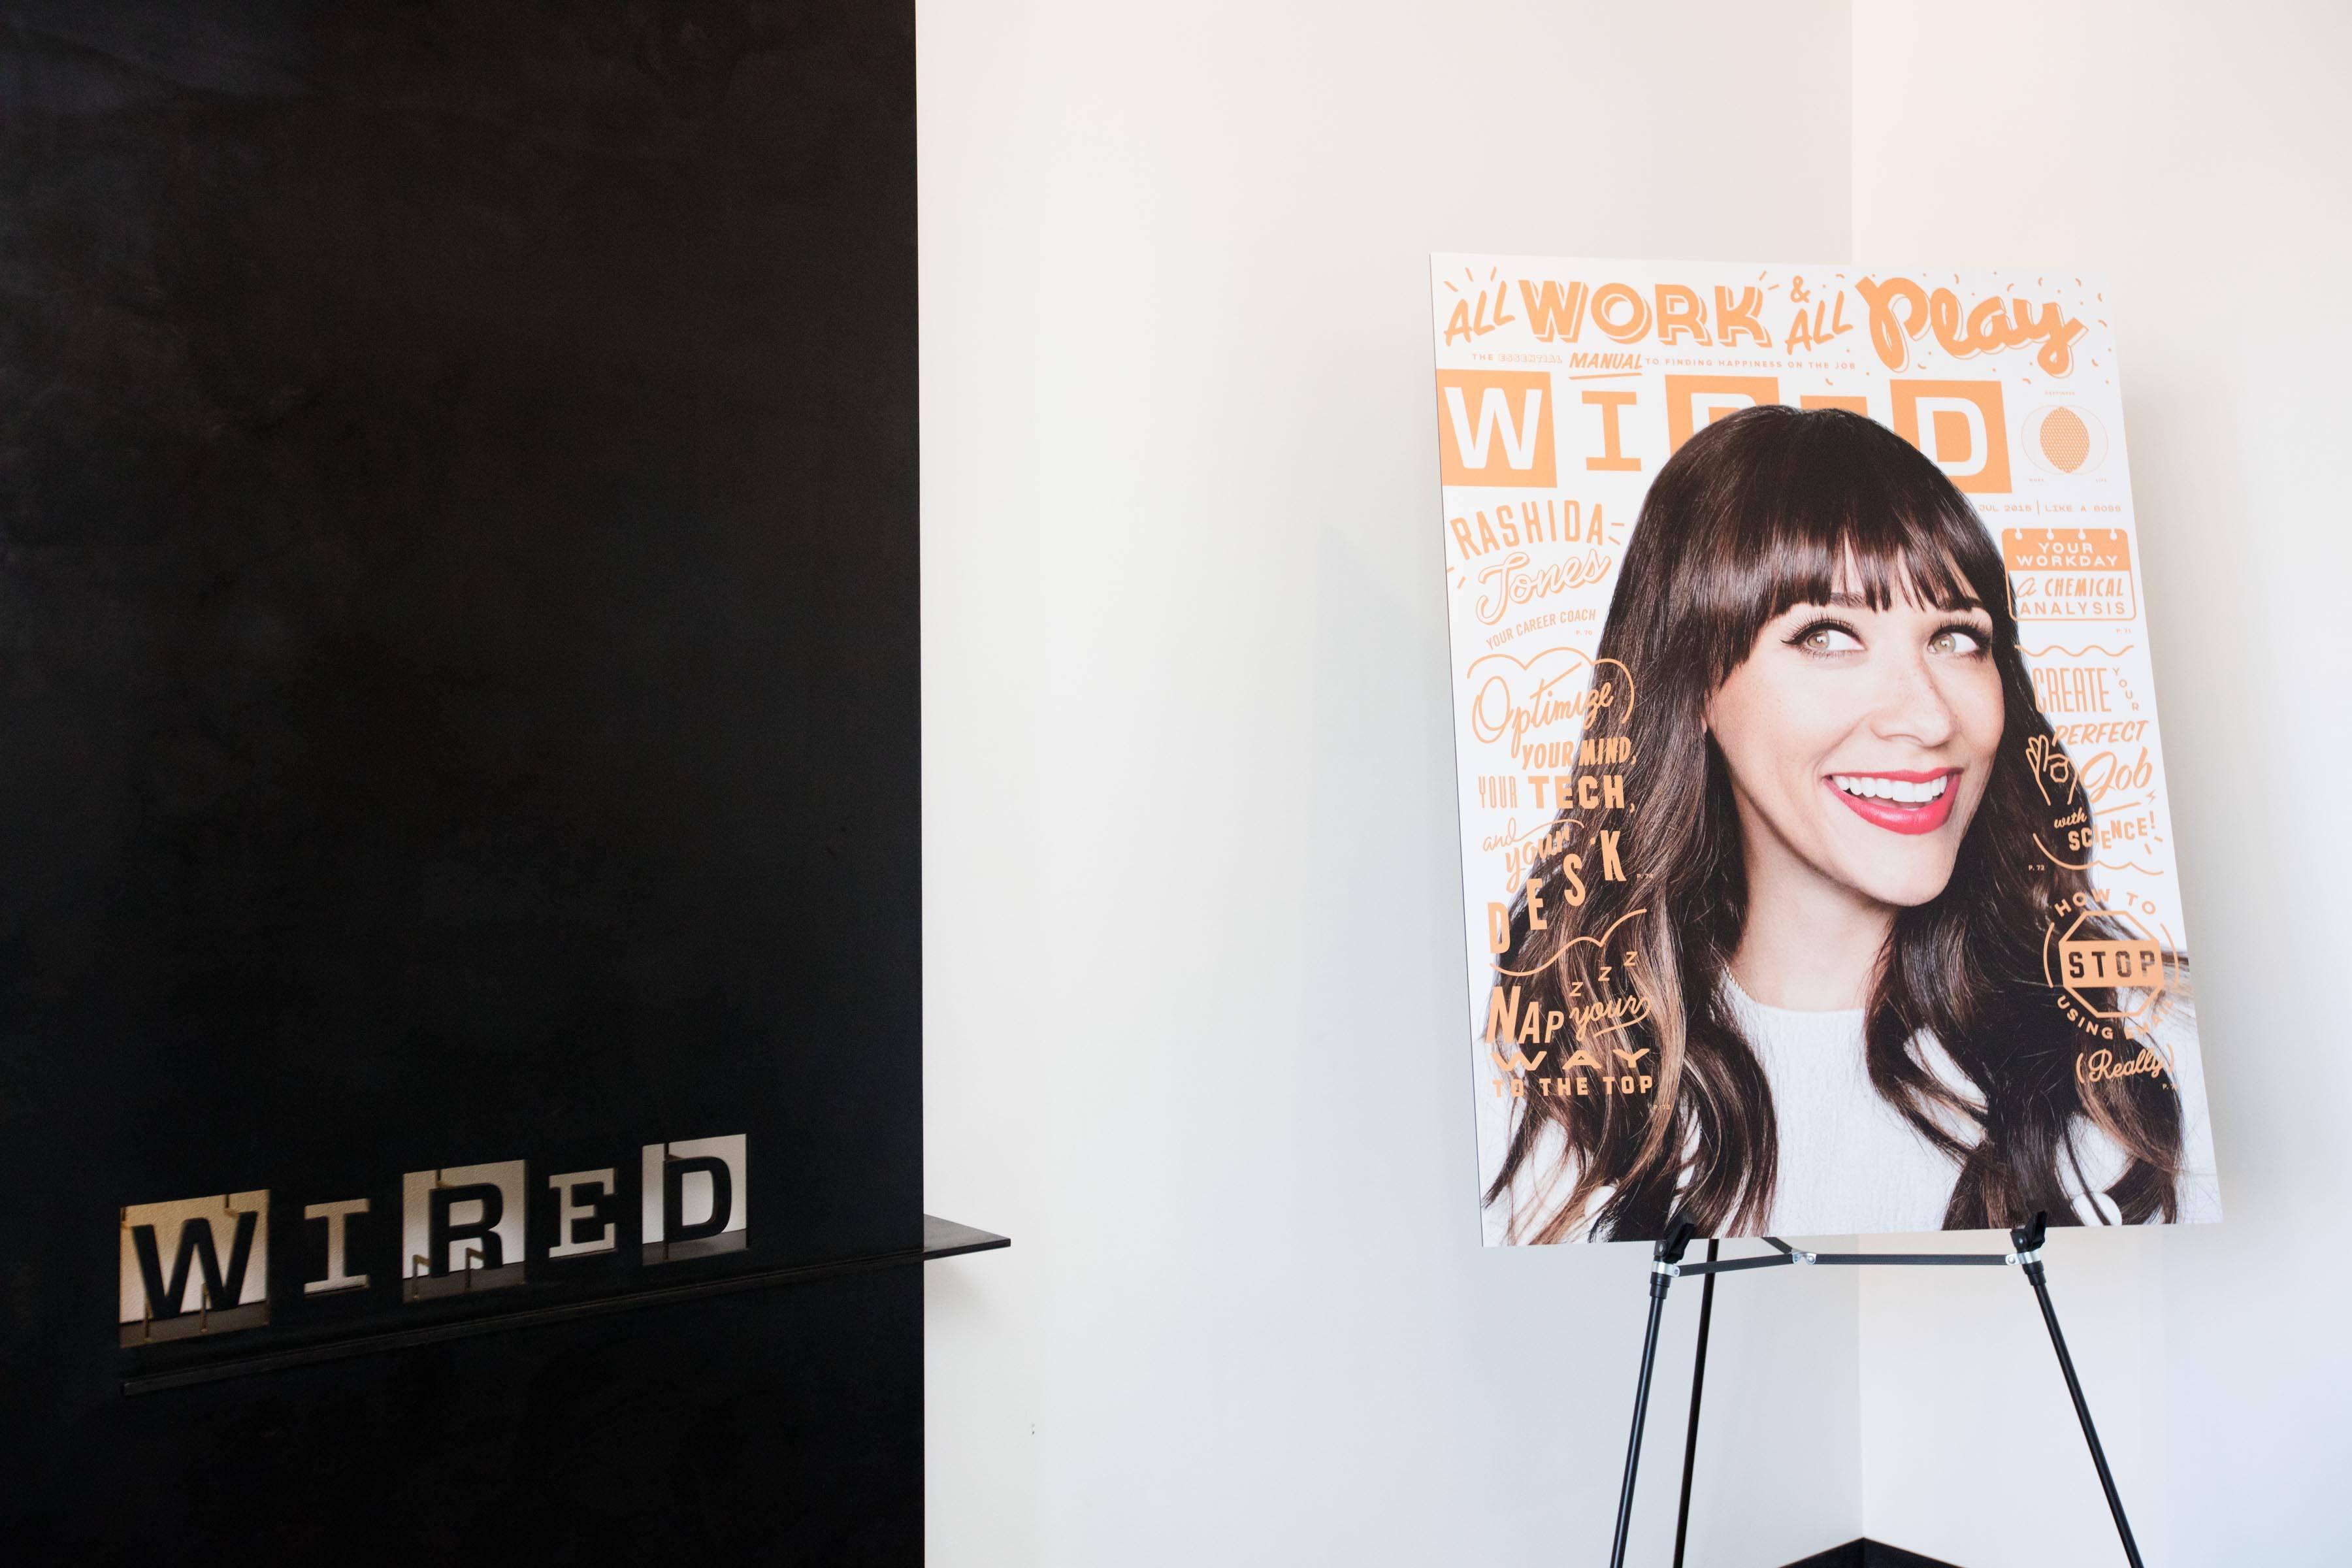 WIRED Cover Girl Rashida Jones Parties In San Francisco